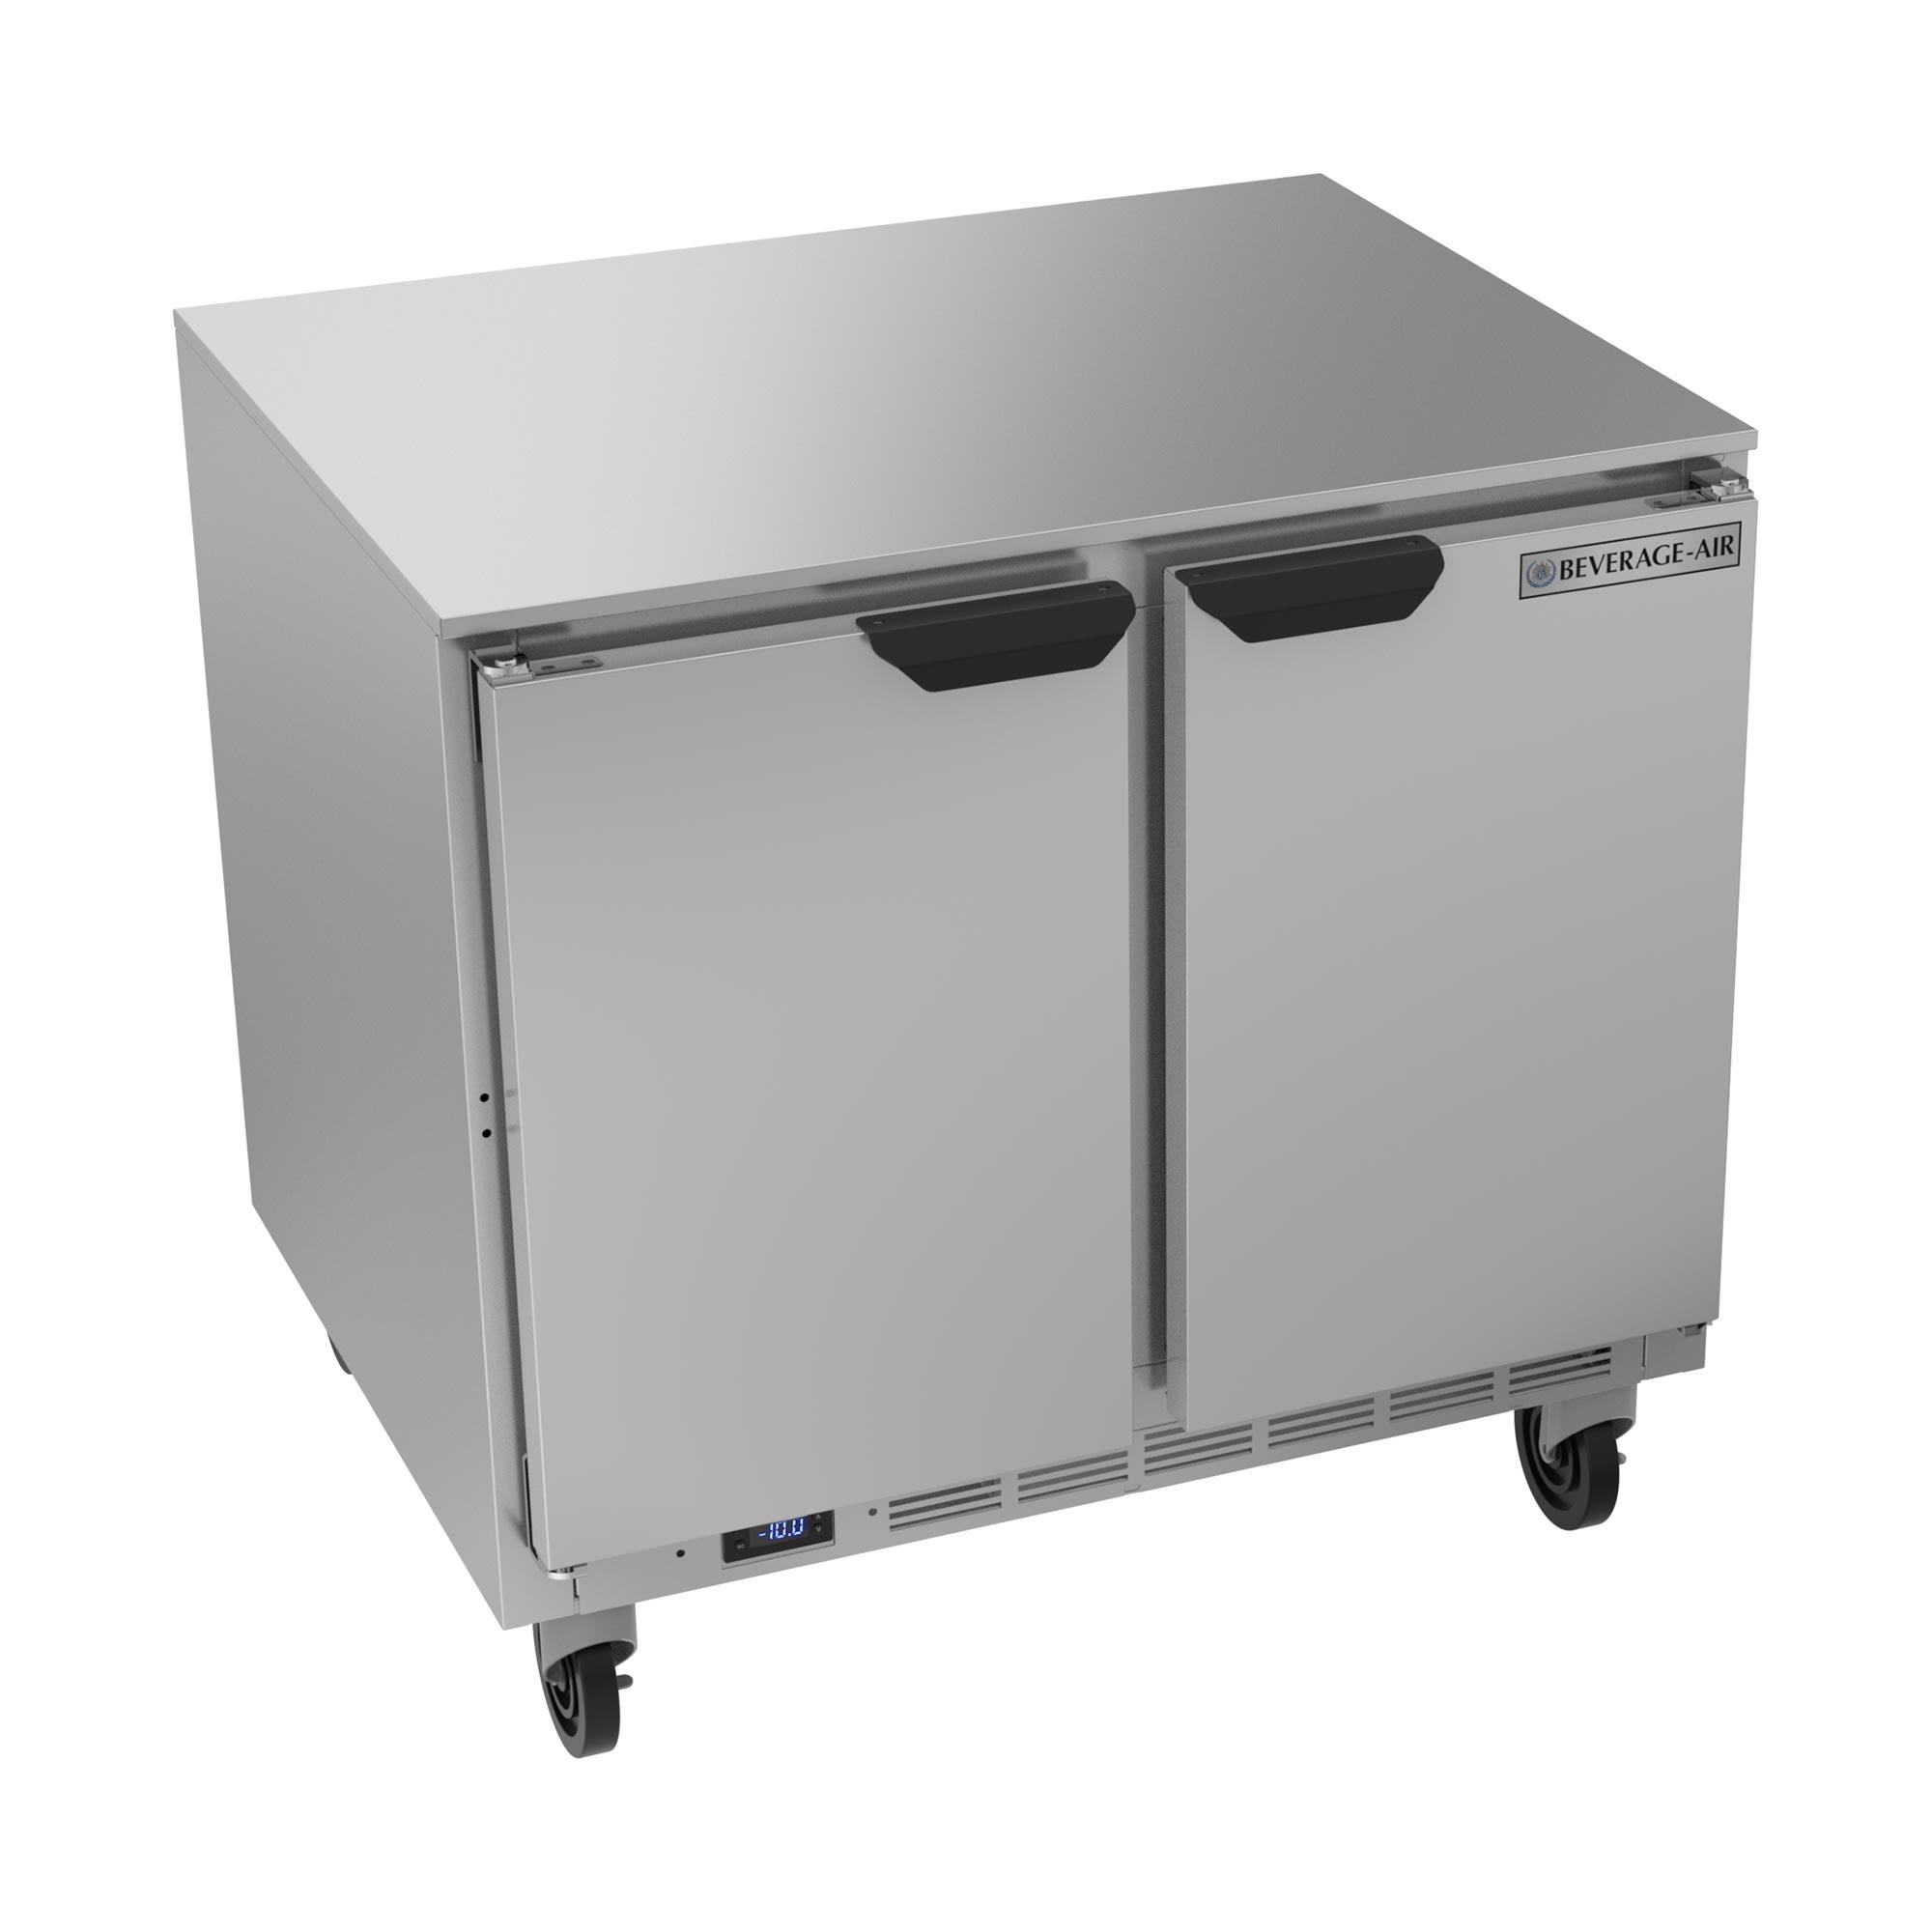 Beverage Air UCF36AHC 8.69-cu ft Undercounter Freezer w/ (2) Section & (2) Door, 115v